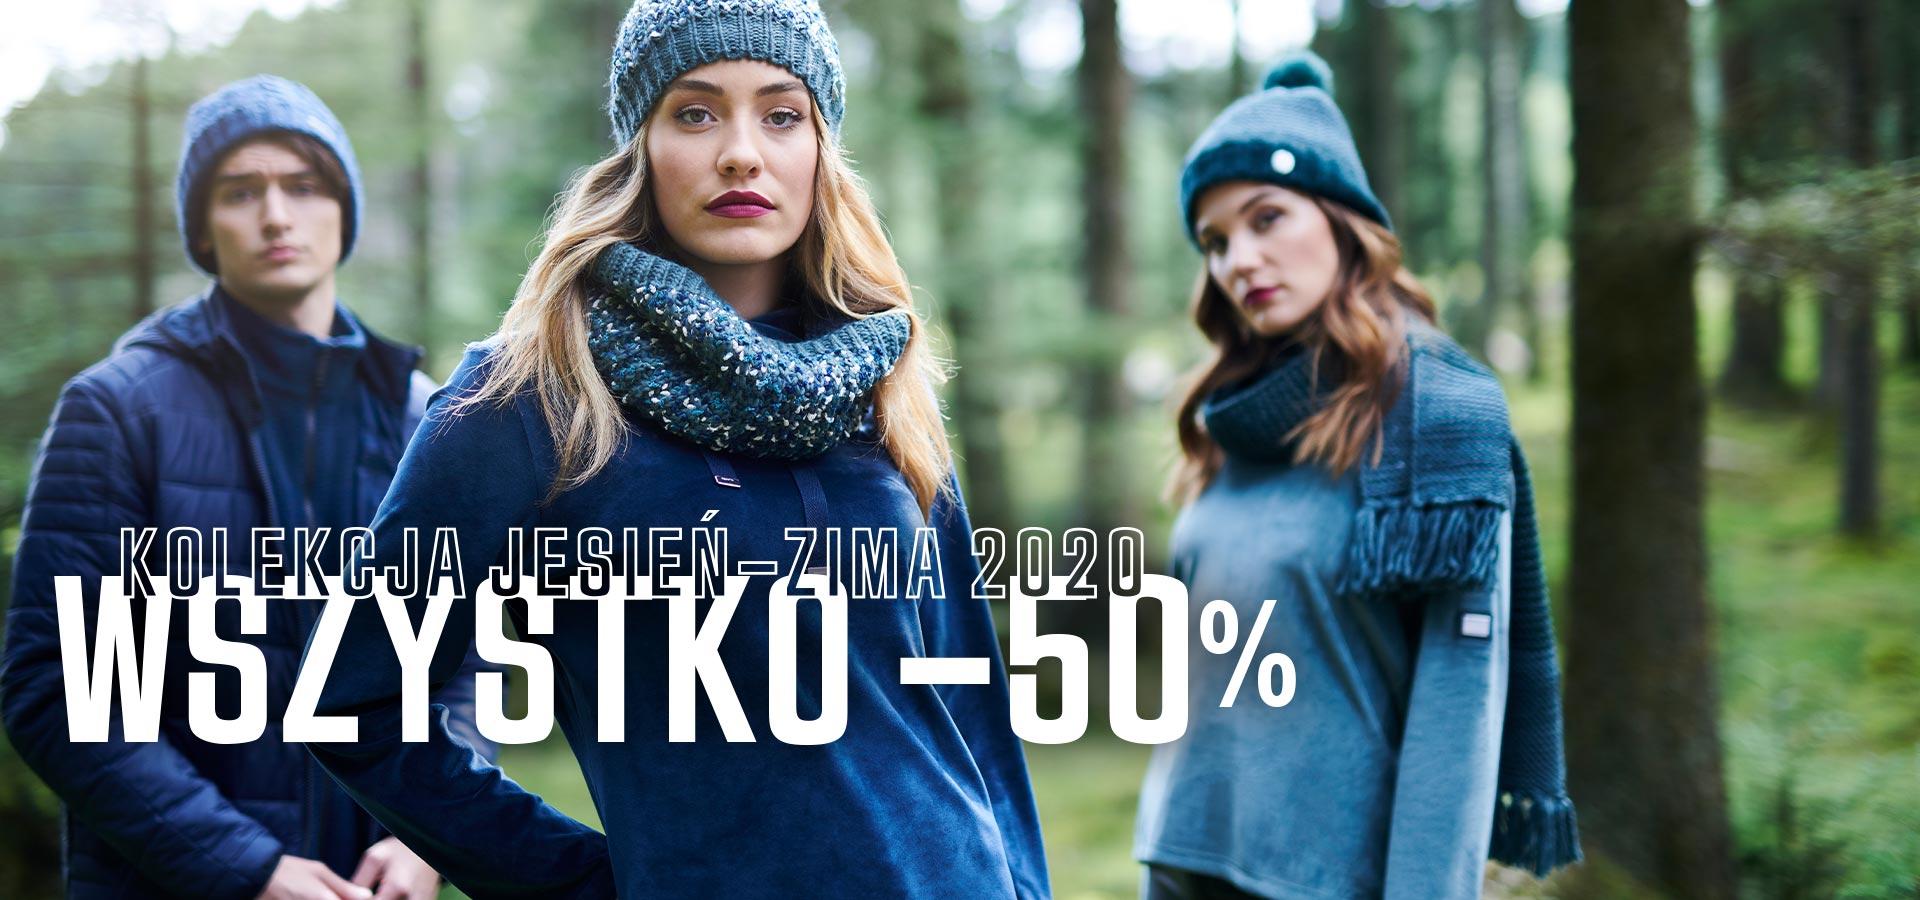 Promocja -50%na asortyment jesień-zima 2020